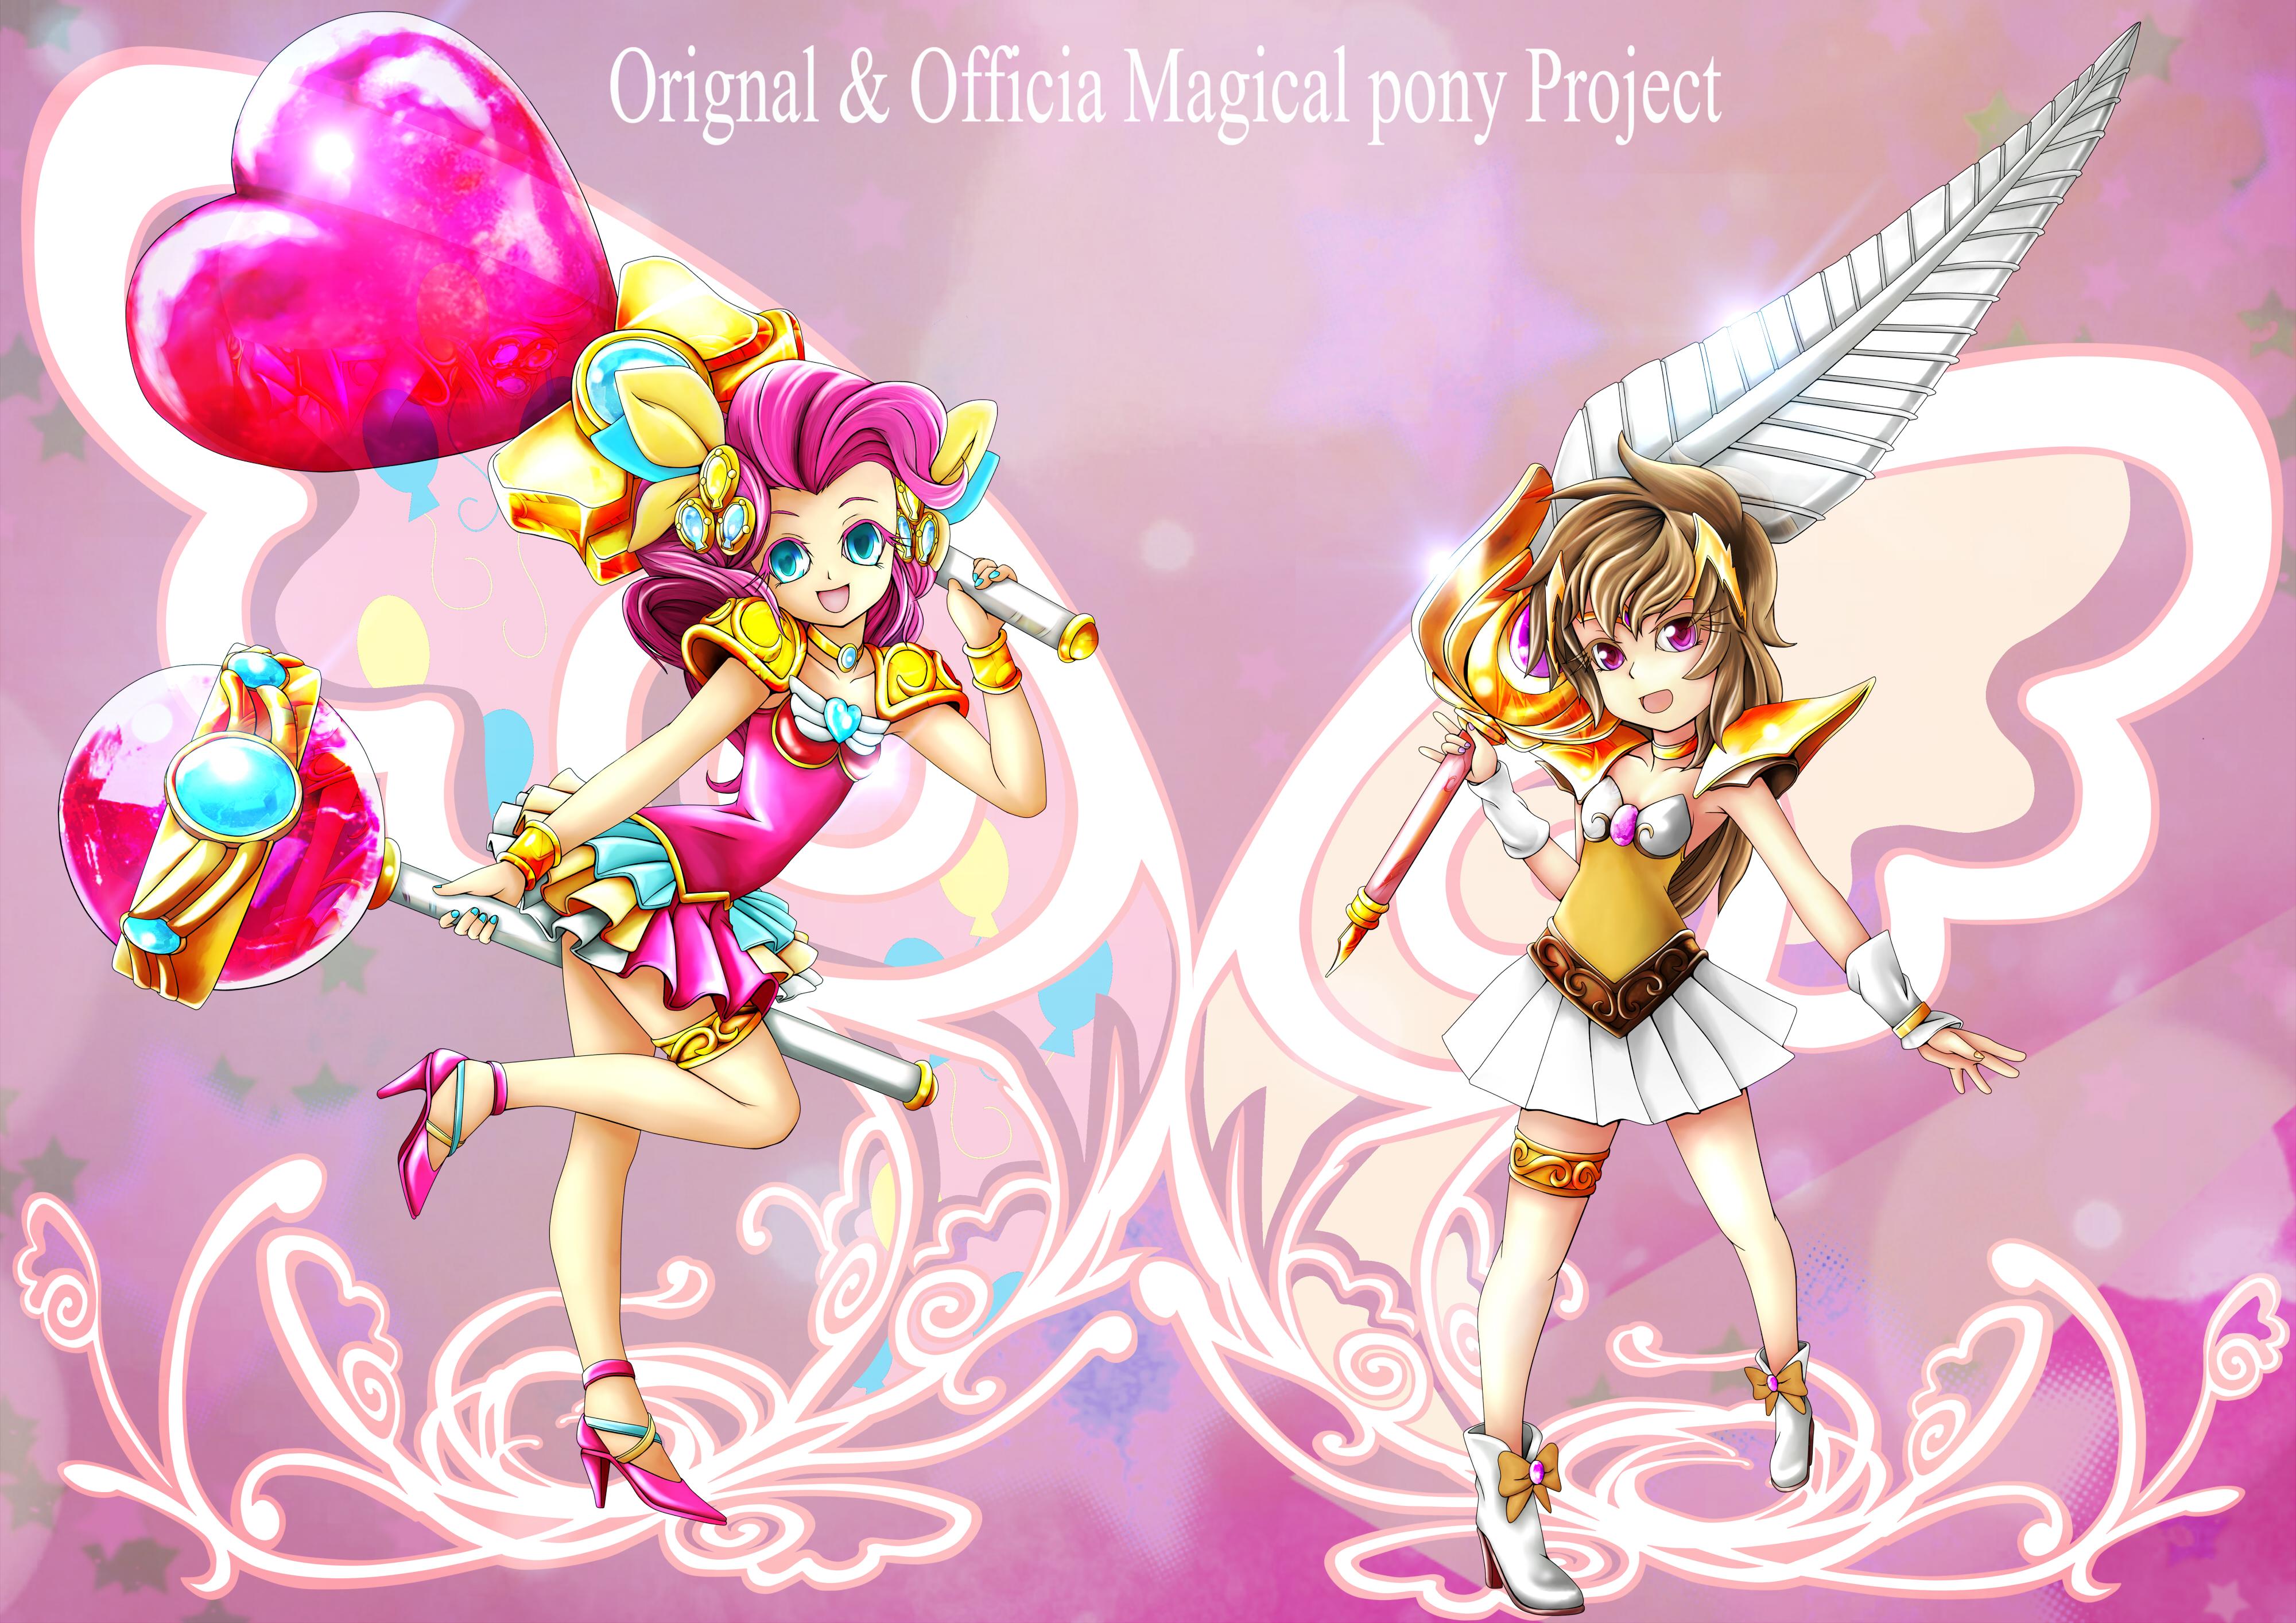 Magical mlp Pinkie Pie oc Nibbus (Human) by skyshek